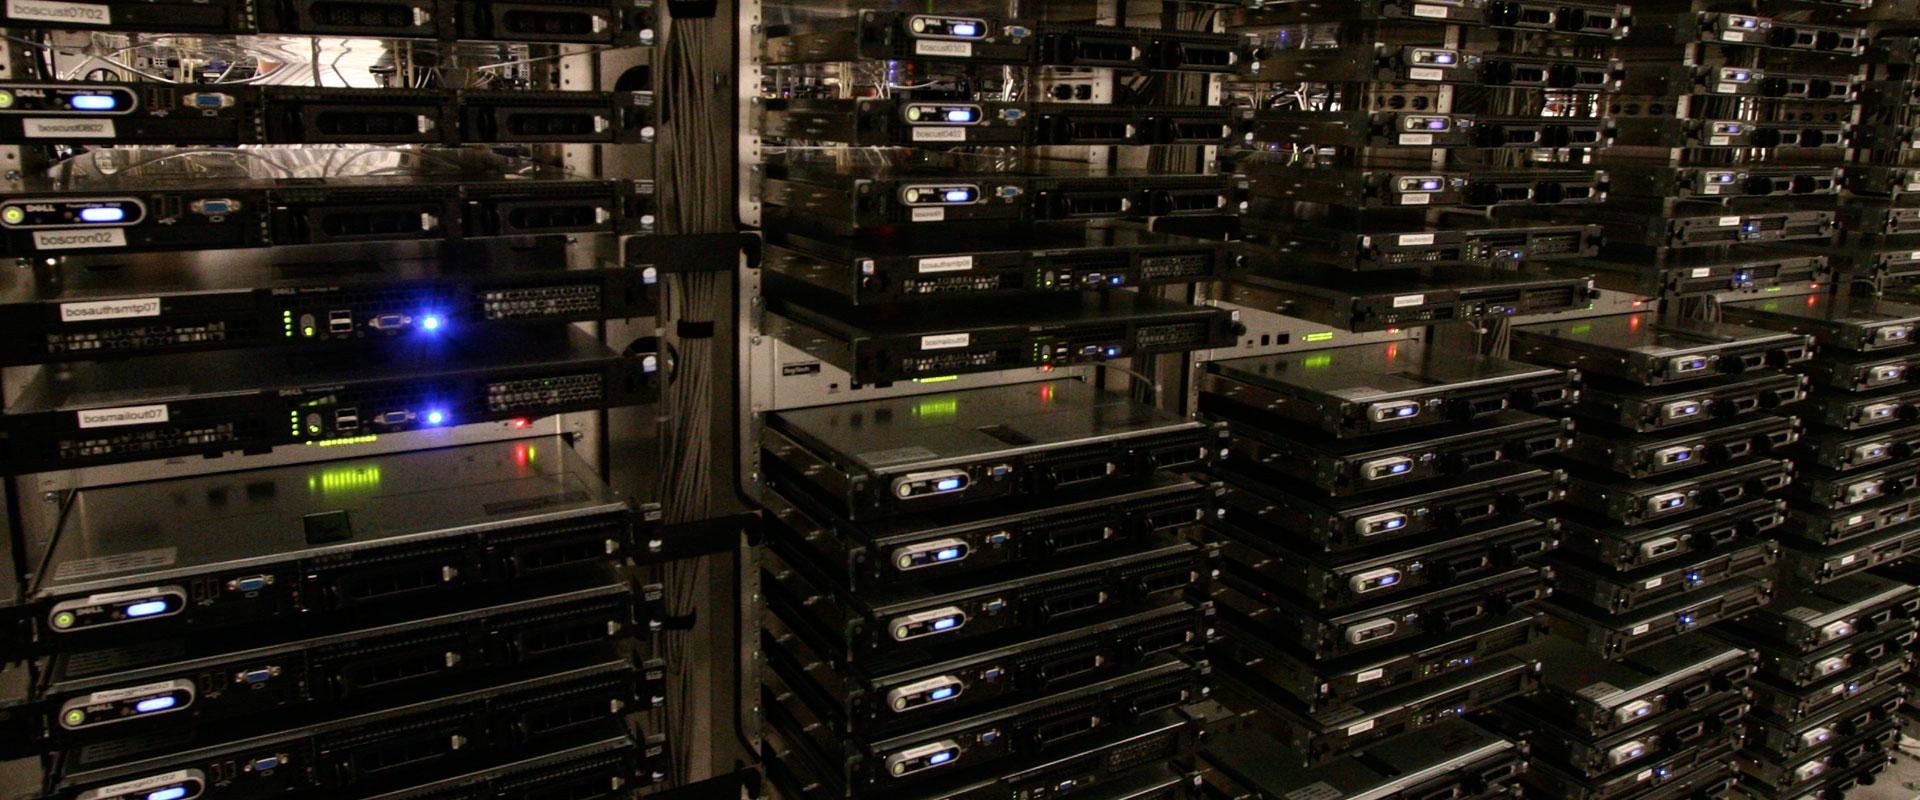 Data Center Setup, Dubai